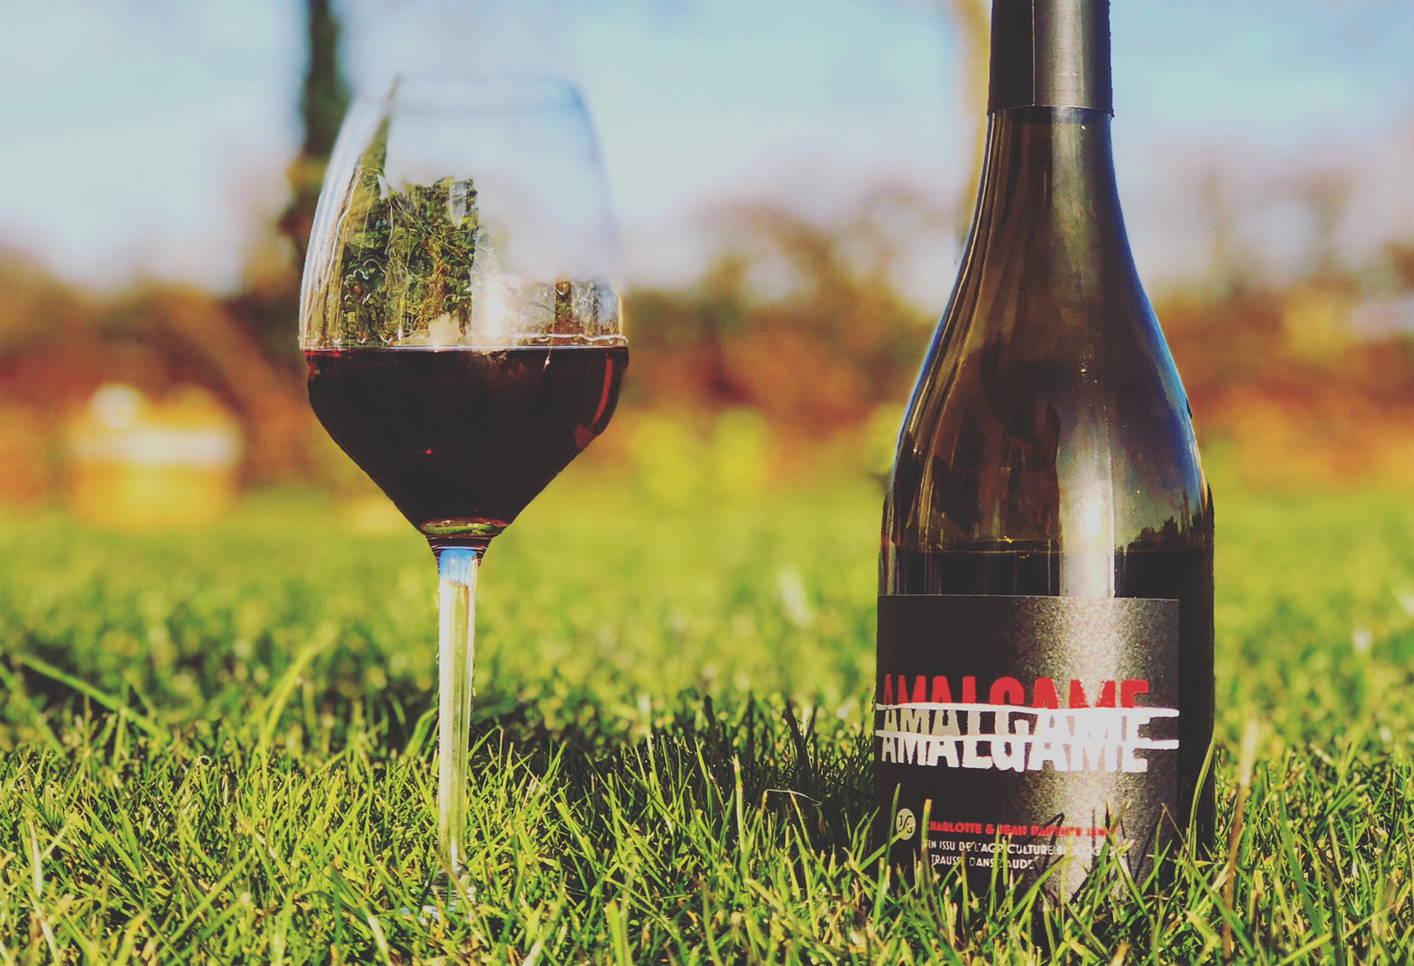 France, vin nature, rawwine, organic wine, vin bio, vin sans intrants, bistro brute, vin rouge, vin blanc, rouge, blanc, nature, vin propre, vigneron, vigneron indépendant, domaine bio, biodynamie, vigneron nature, cave vin naturel, cave vin, caviste, vin biodynamique, bistro brute, Quimper, Finistère